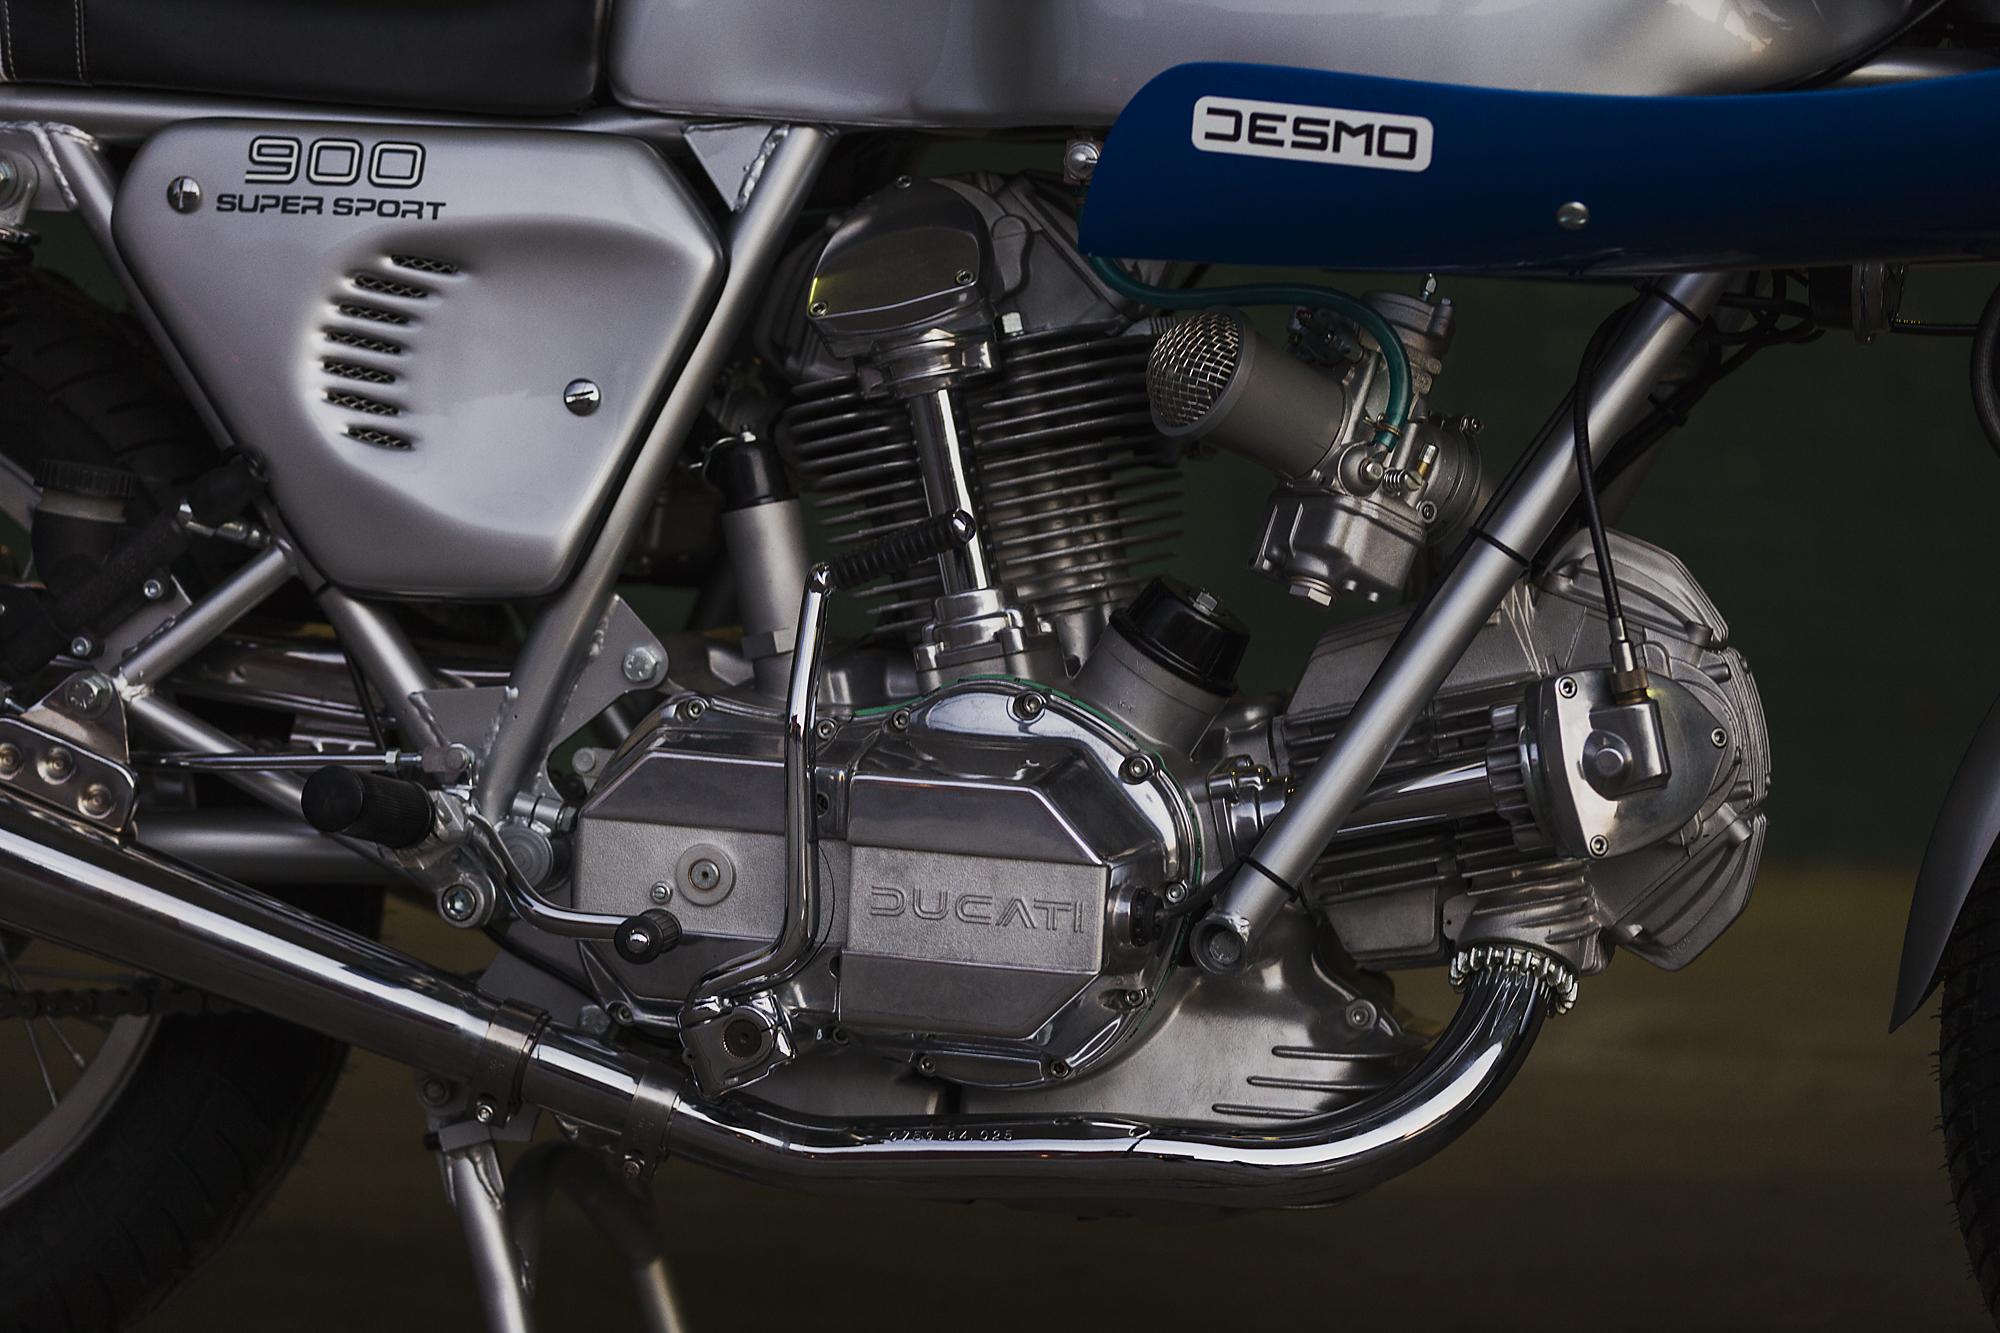 1977 Ducati 900SS exhaust